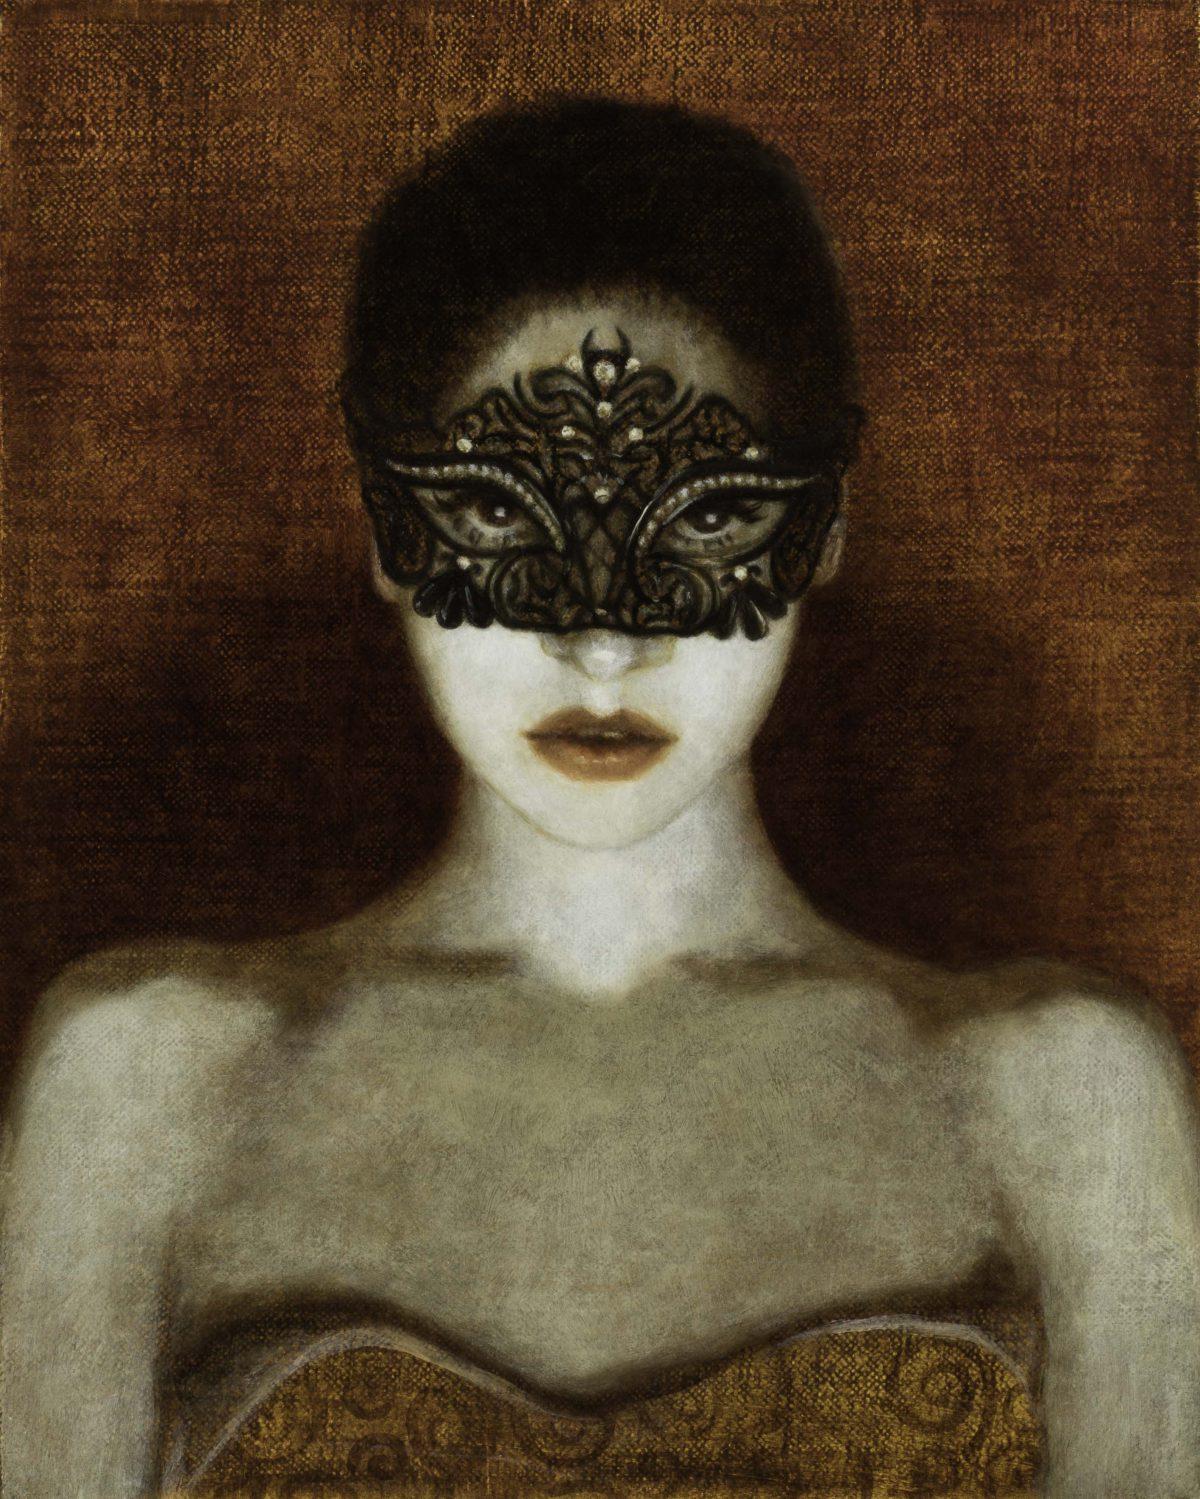 Mask Girl, 2017 © Deirdre Sullivan-Beeman